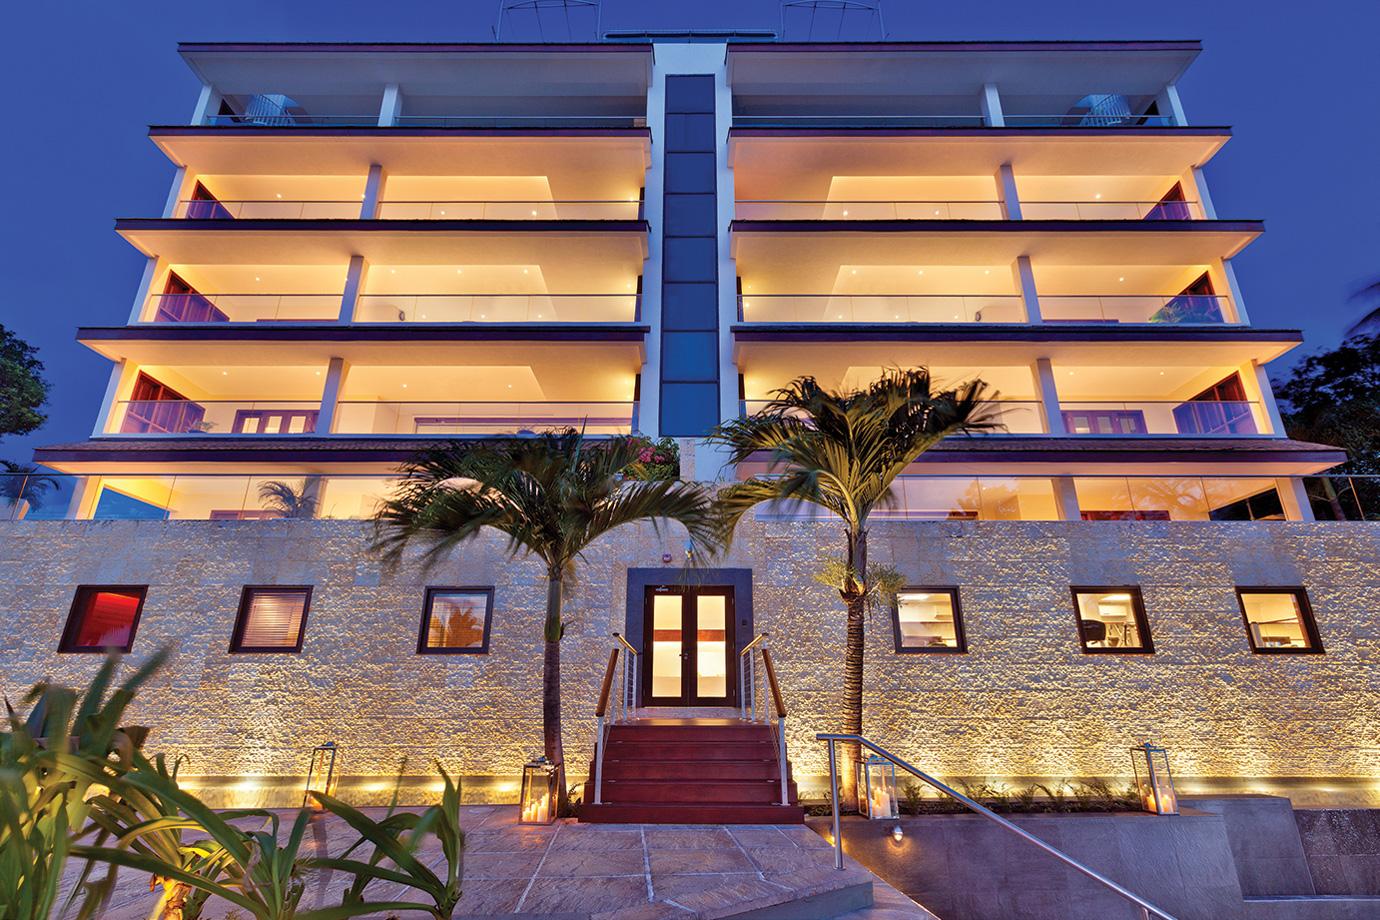 PJC-Light-Studio-Portico-Barbados-01W.jpg